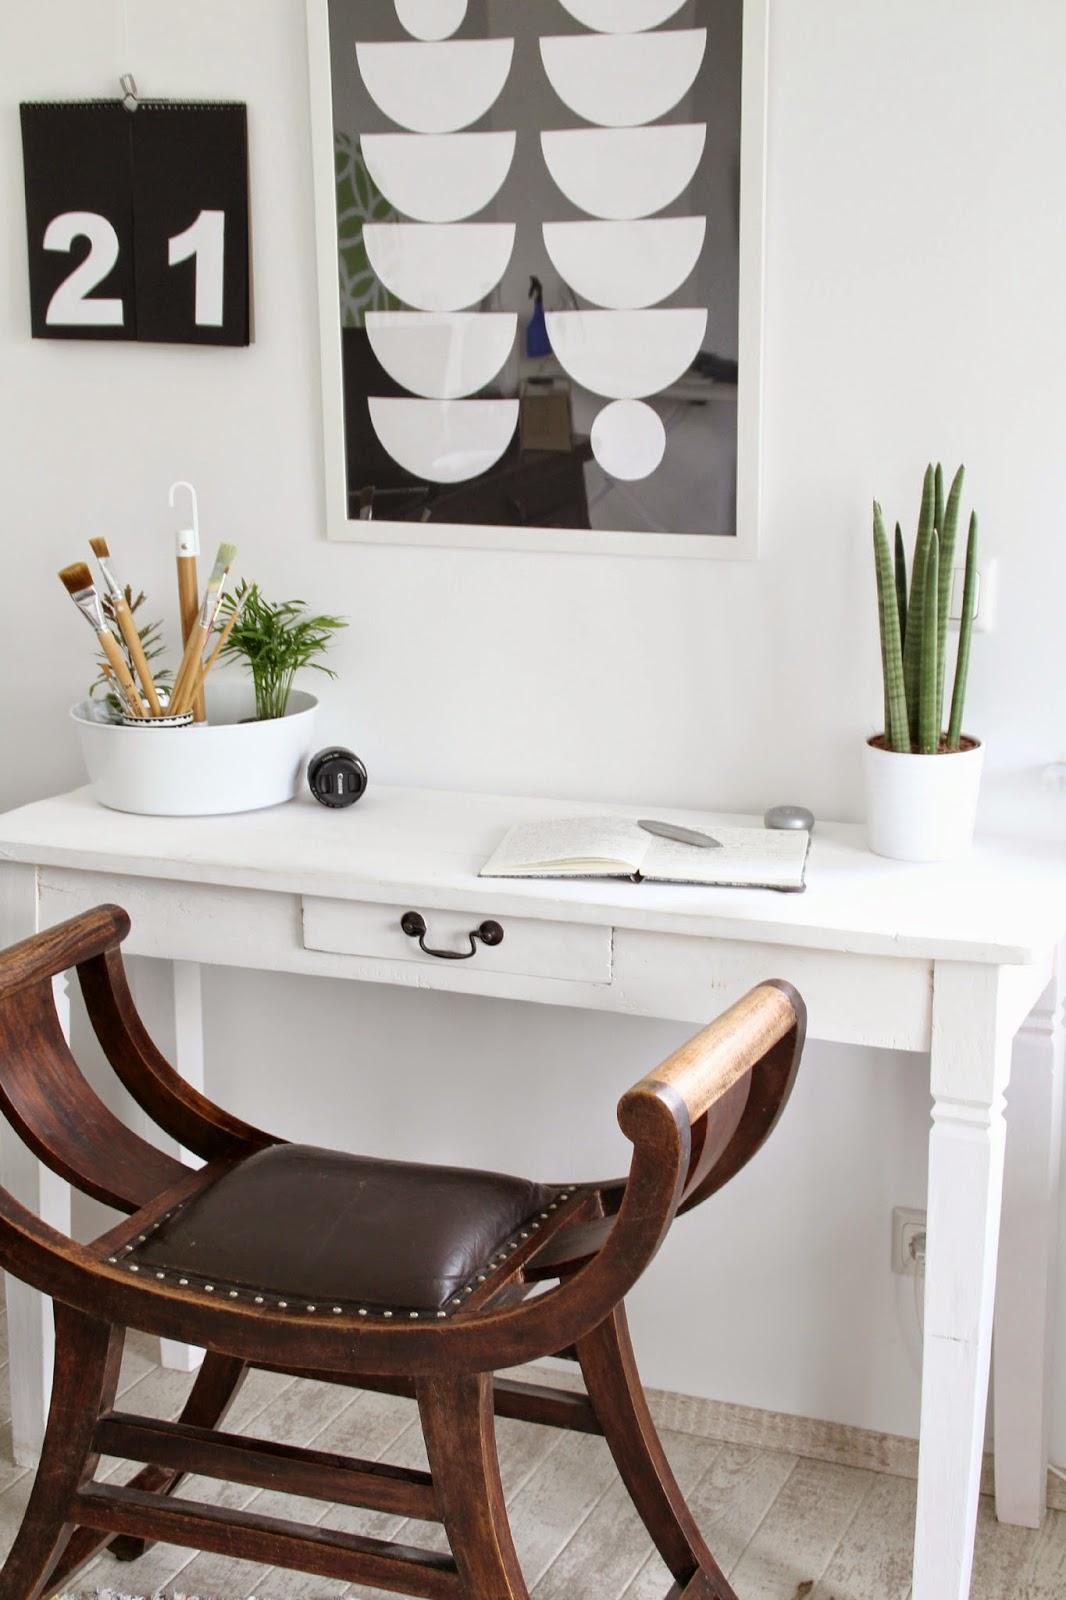 Lady Stil: Ikea*hack - Pflanzen - DIY